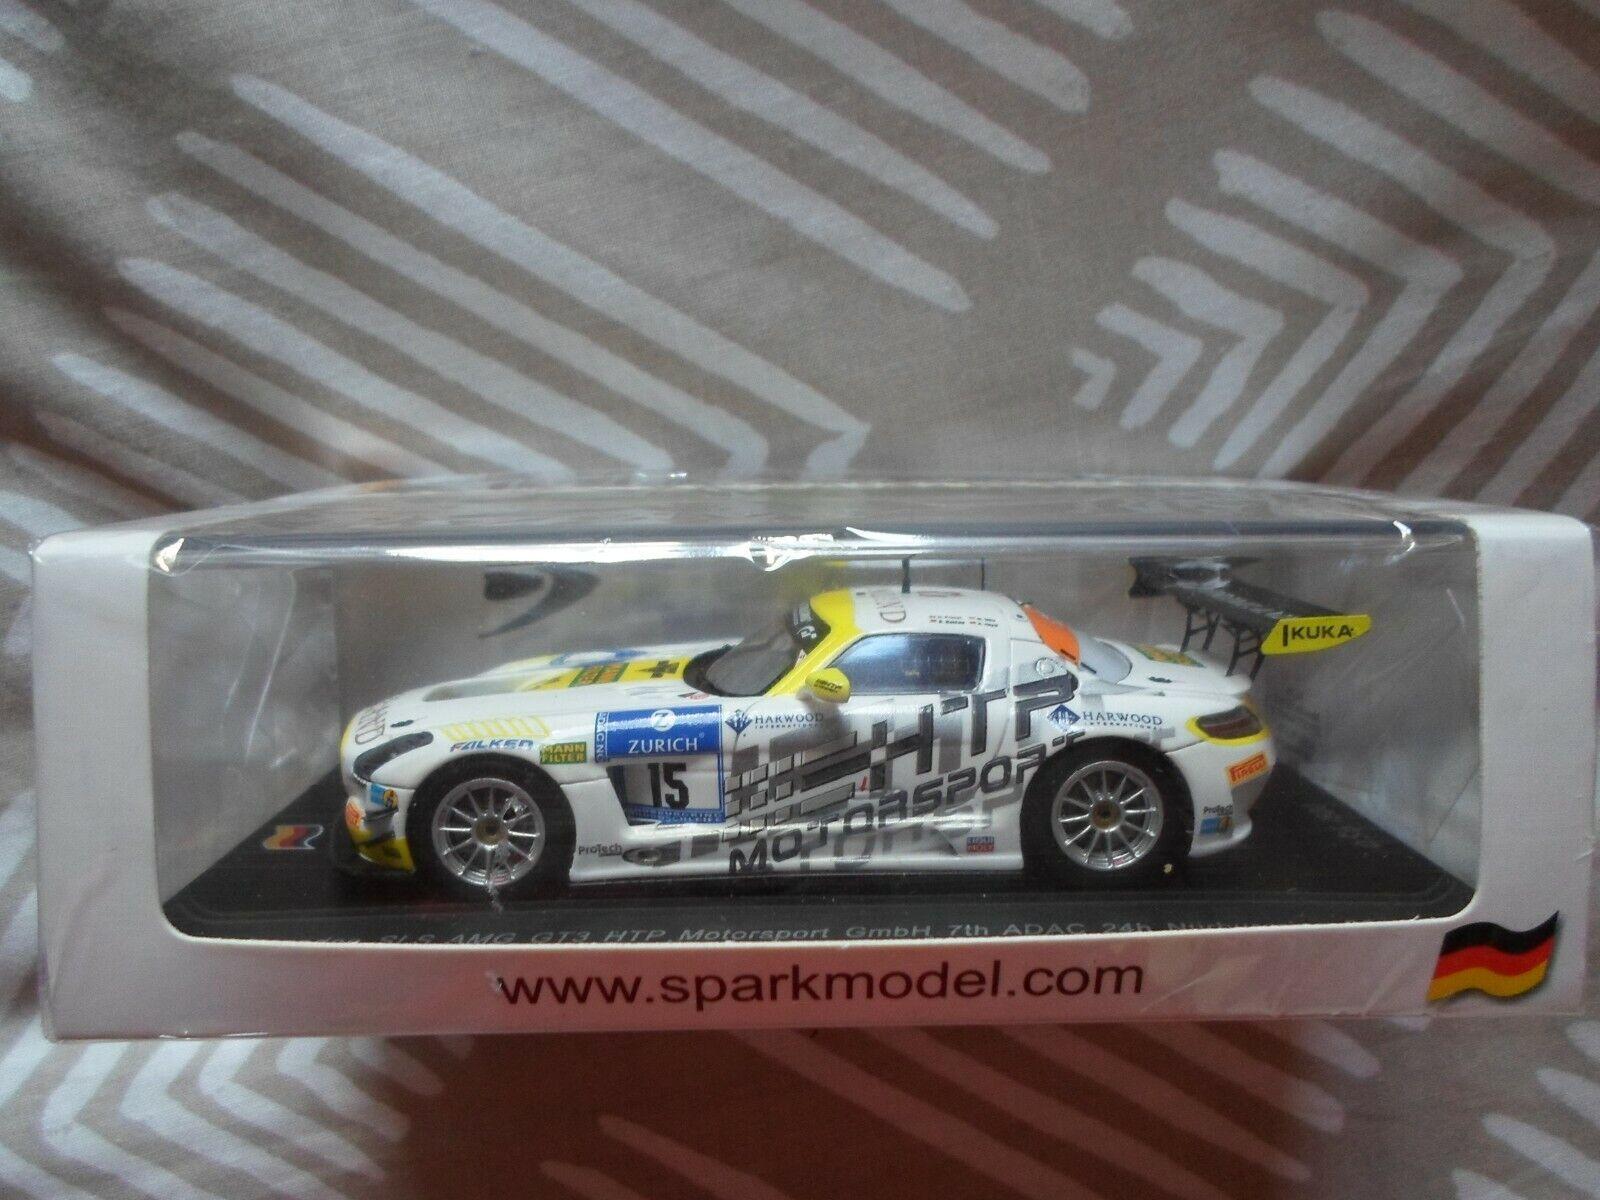 Model Car - 1 43 - Nurburgring 24 Hour - Mercedes Benz SLS AMG GT3  15 2014